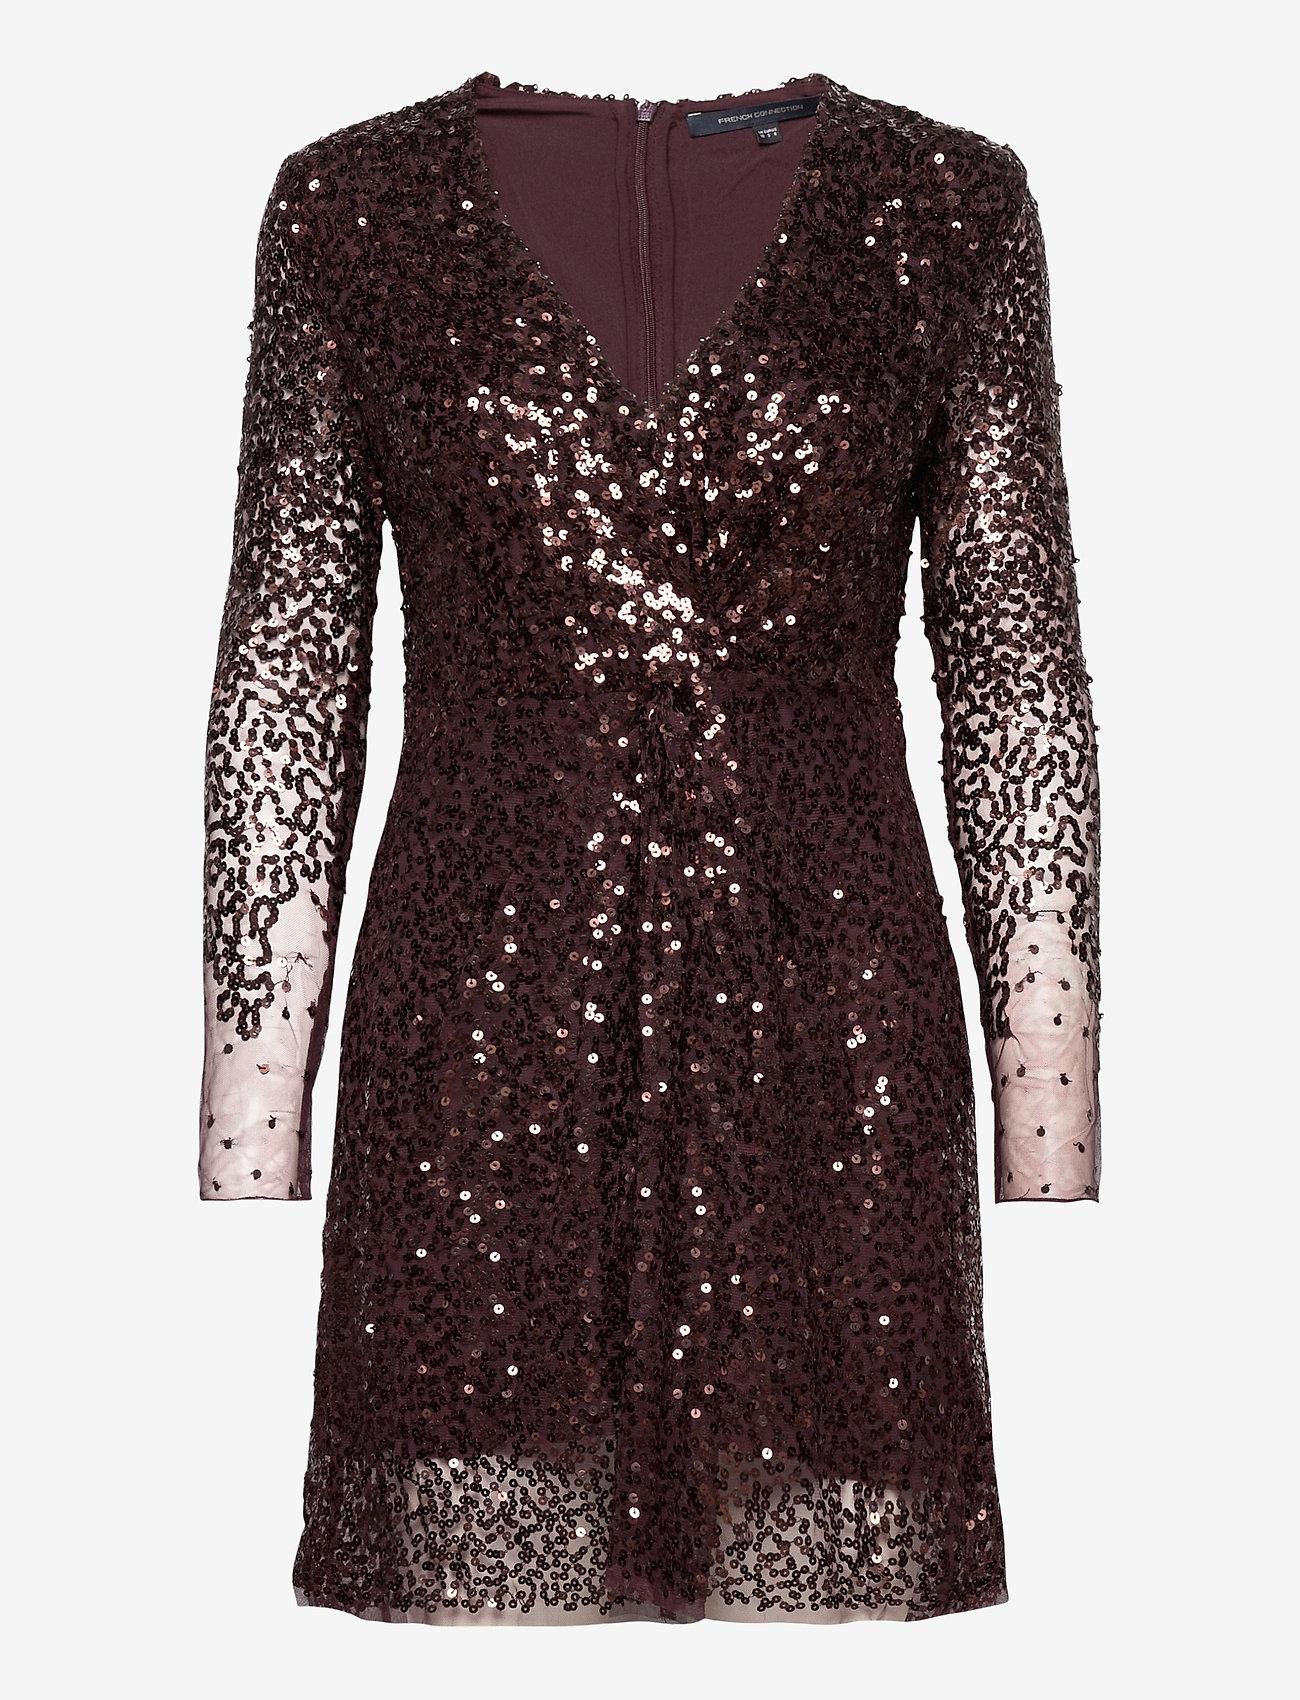 French Connection - EMILLE SPARKLE SHORT DRESS - paljettkjoler - decadence - 0